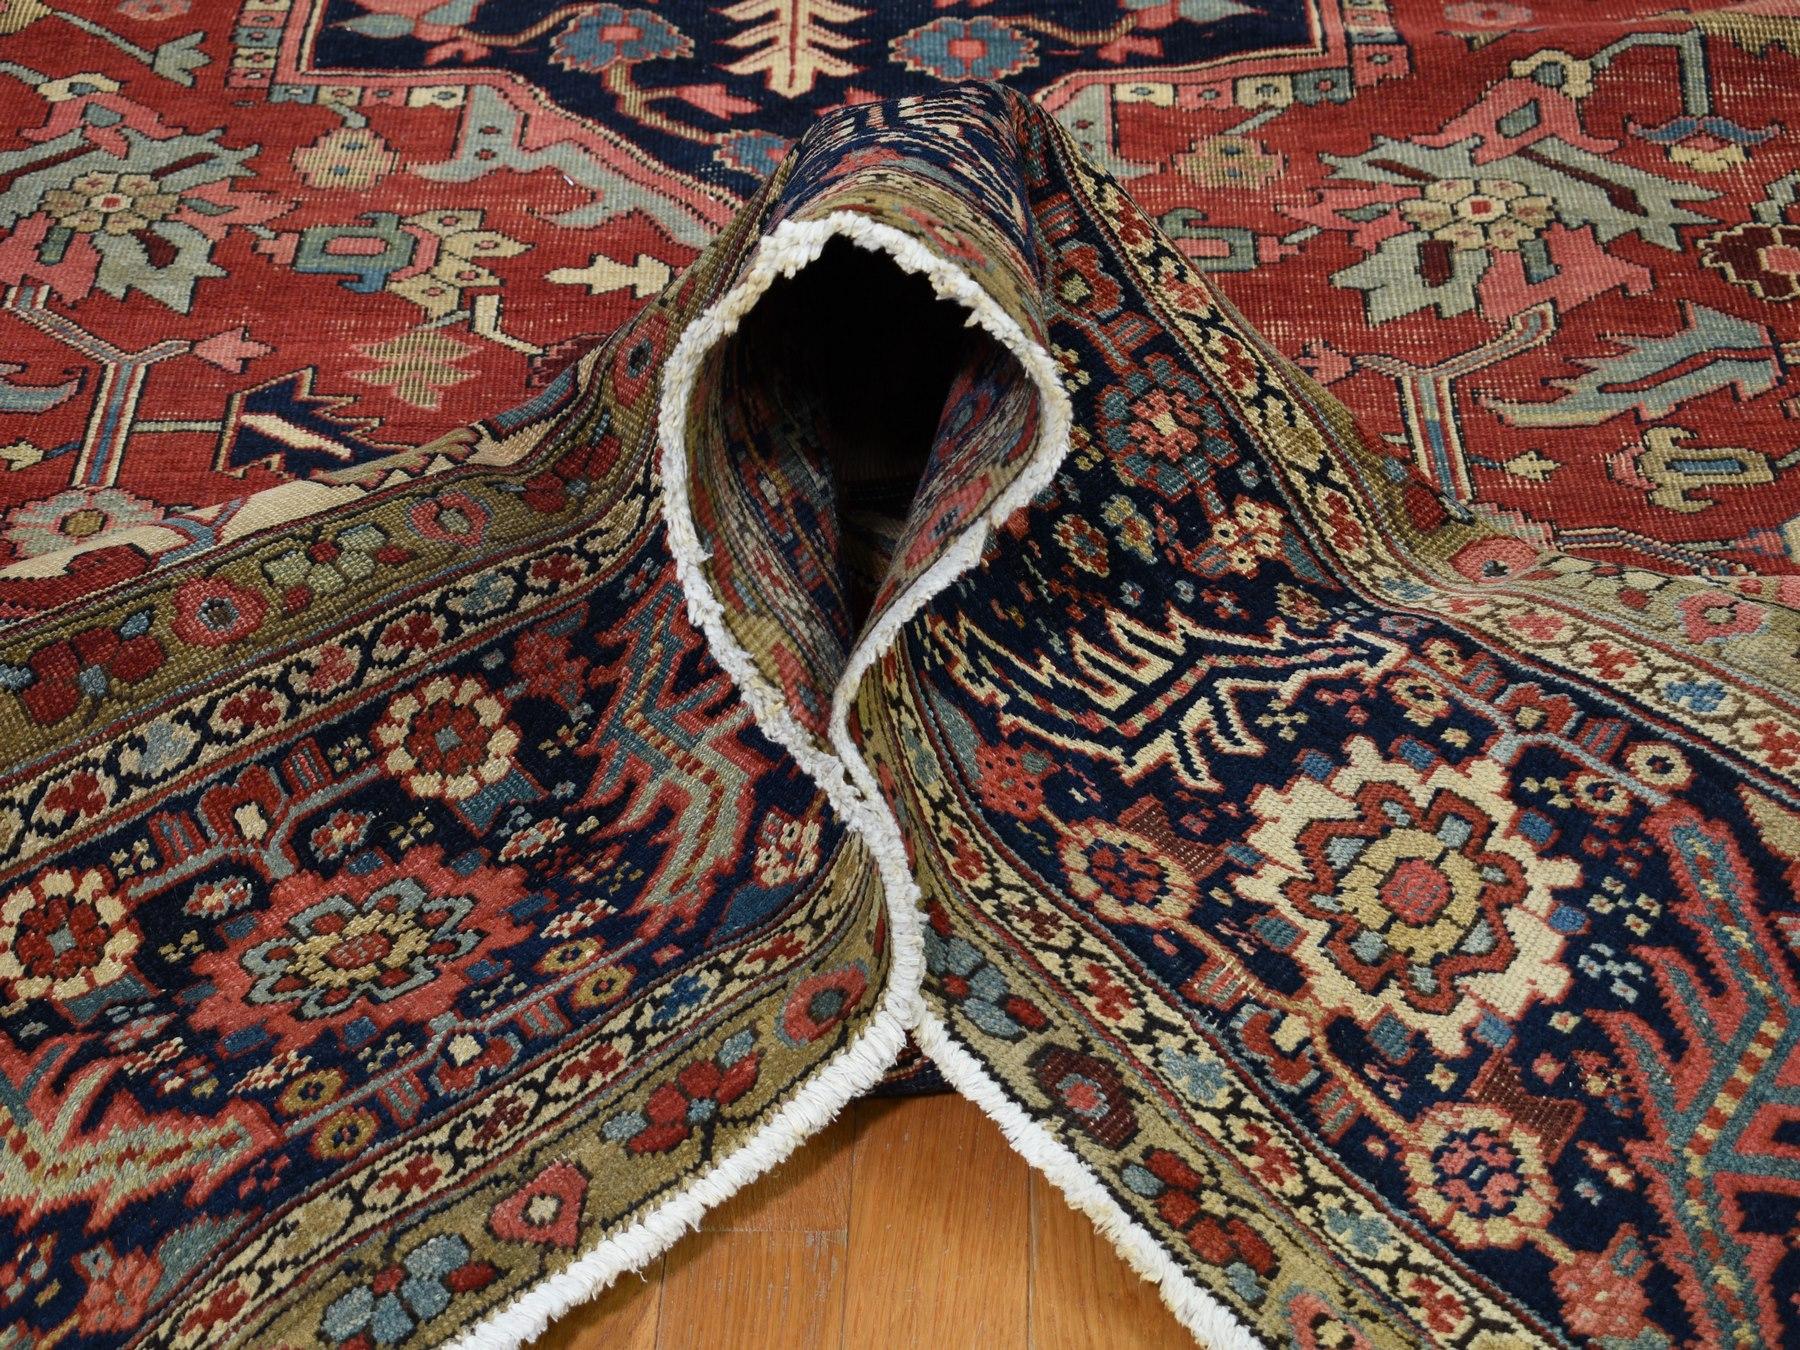 12 1 Quot X19 5 Quot Large Size Original Antique Persian Serapi